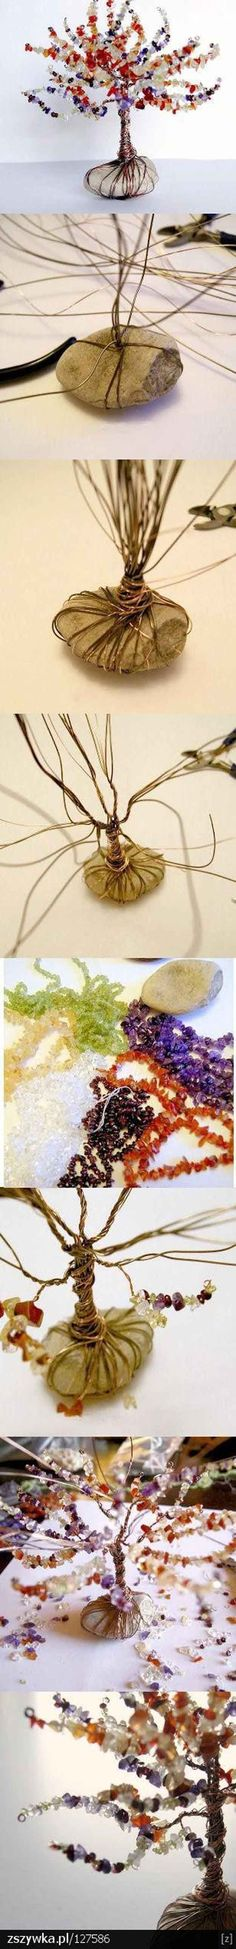 Fun DIY Tree of LIfe Decoration and Ideas   https://diyprojects.com/12-diy-tree-of-life-ideas/ #artprojects